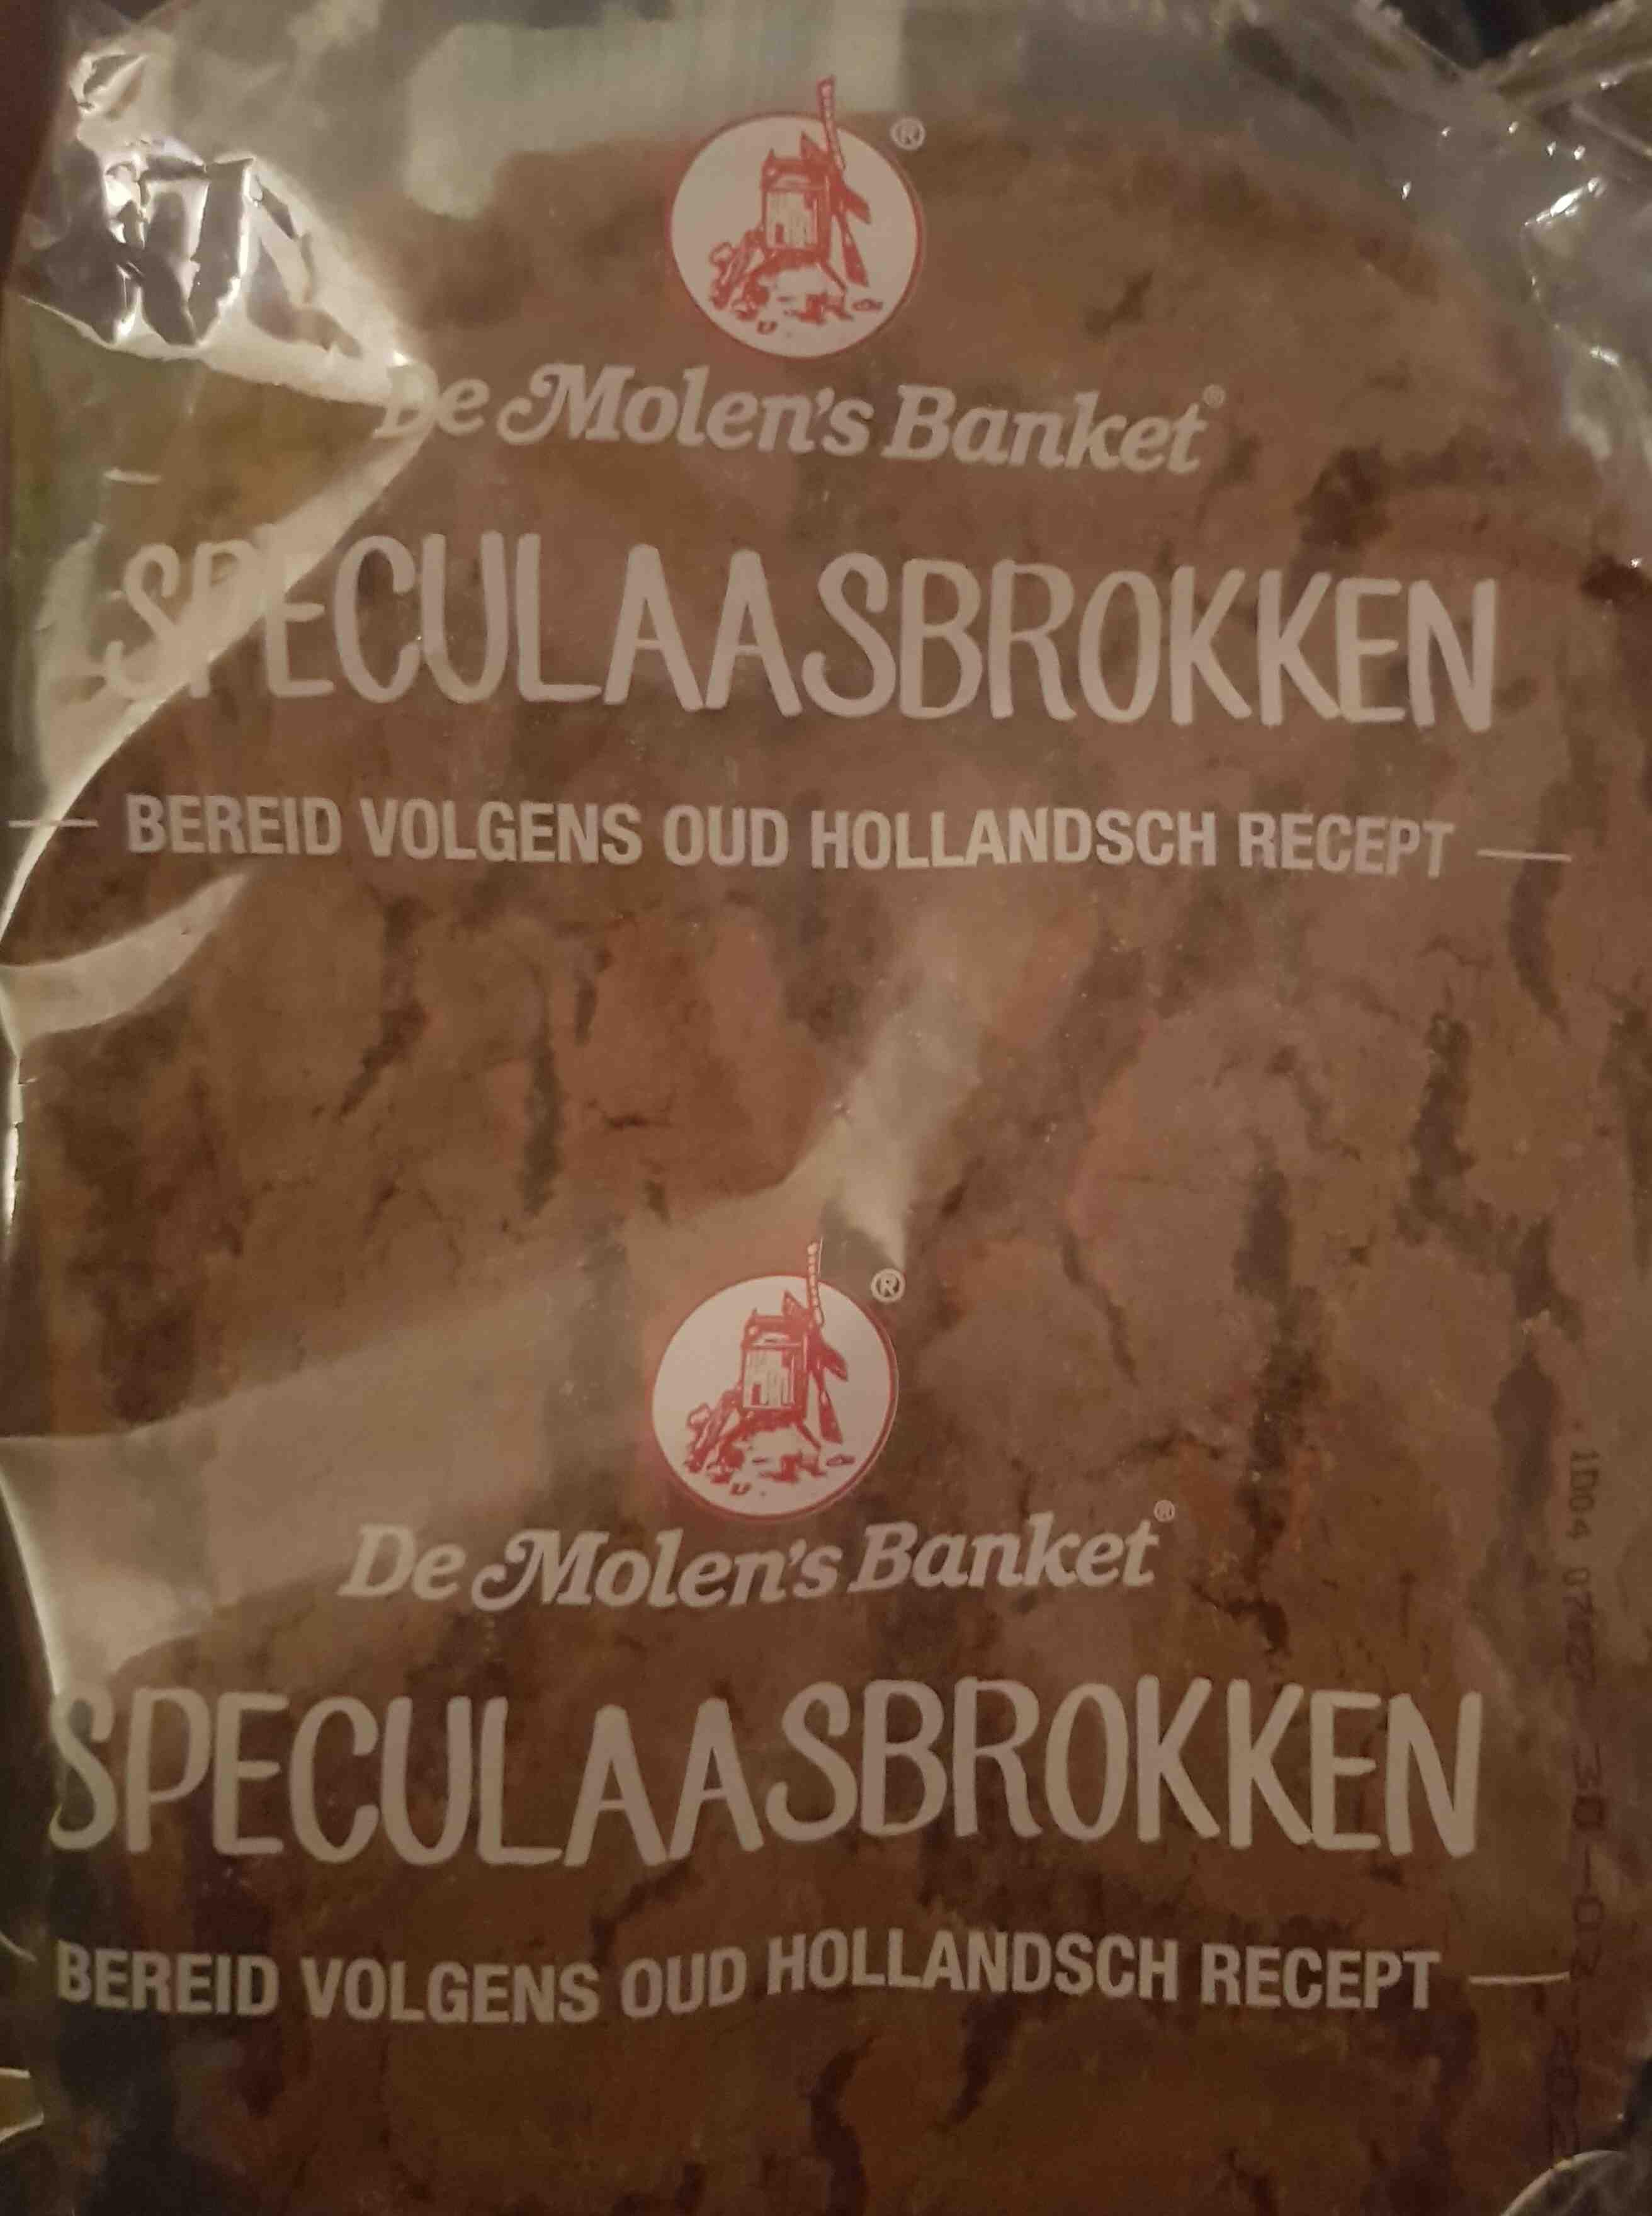 speculaasbrokken - Product